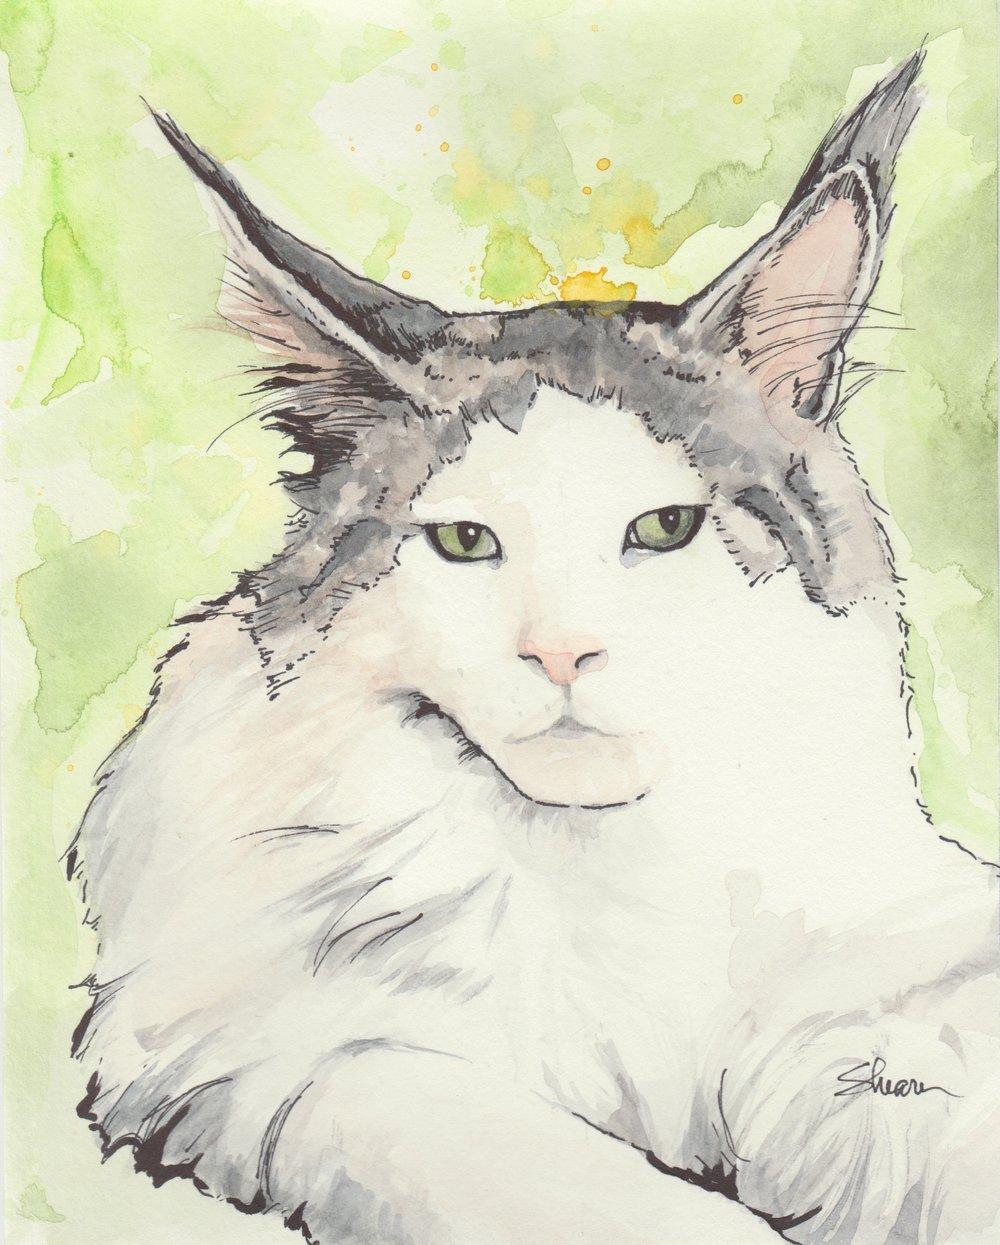 Volker_cat.jpeg